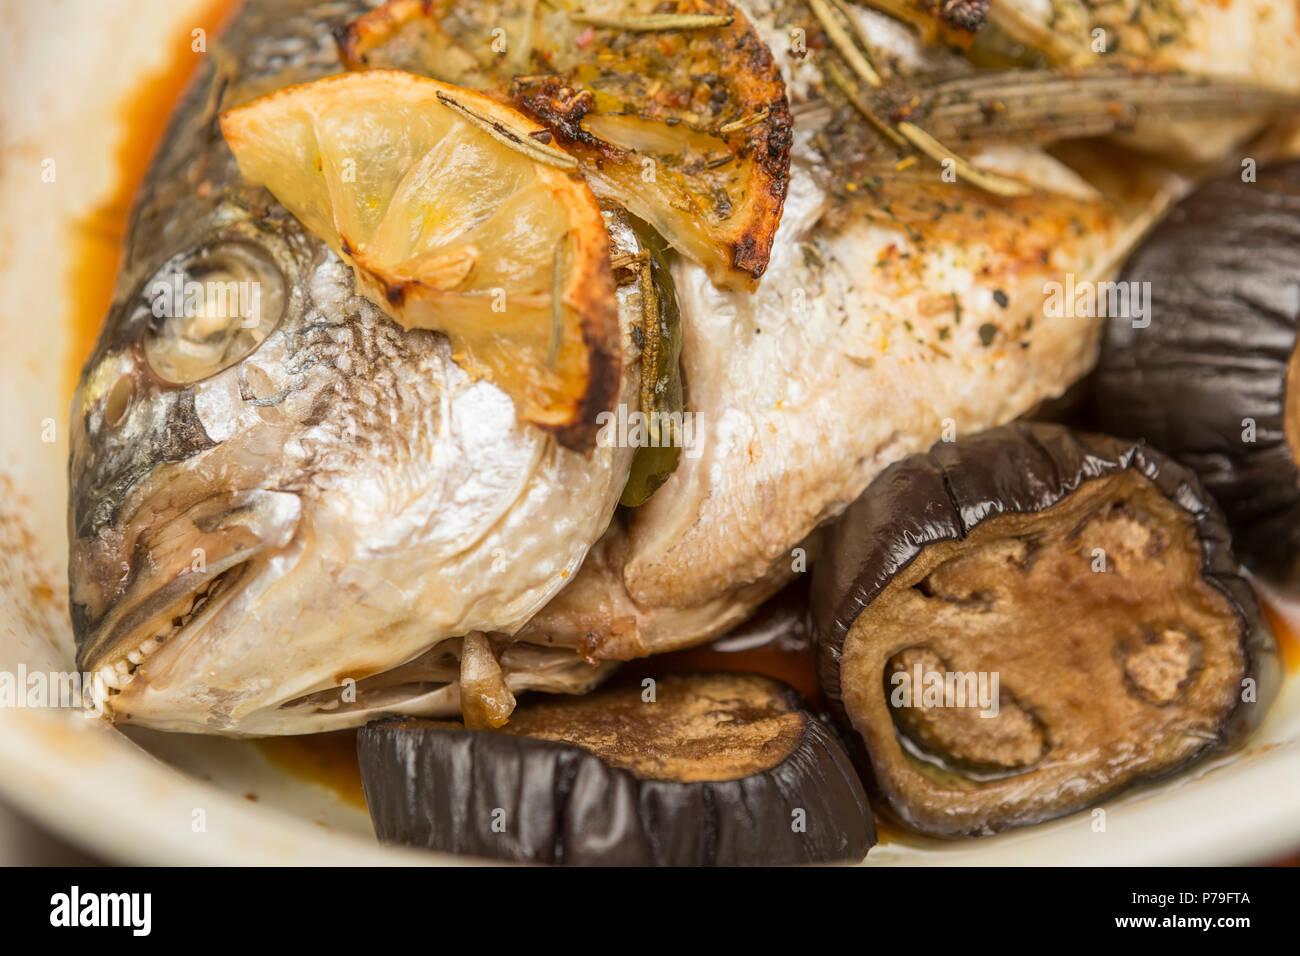 Baked dorado fish with lemon and eggplant. Stock Photo